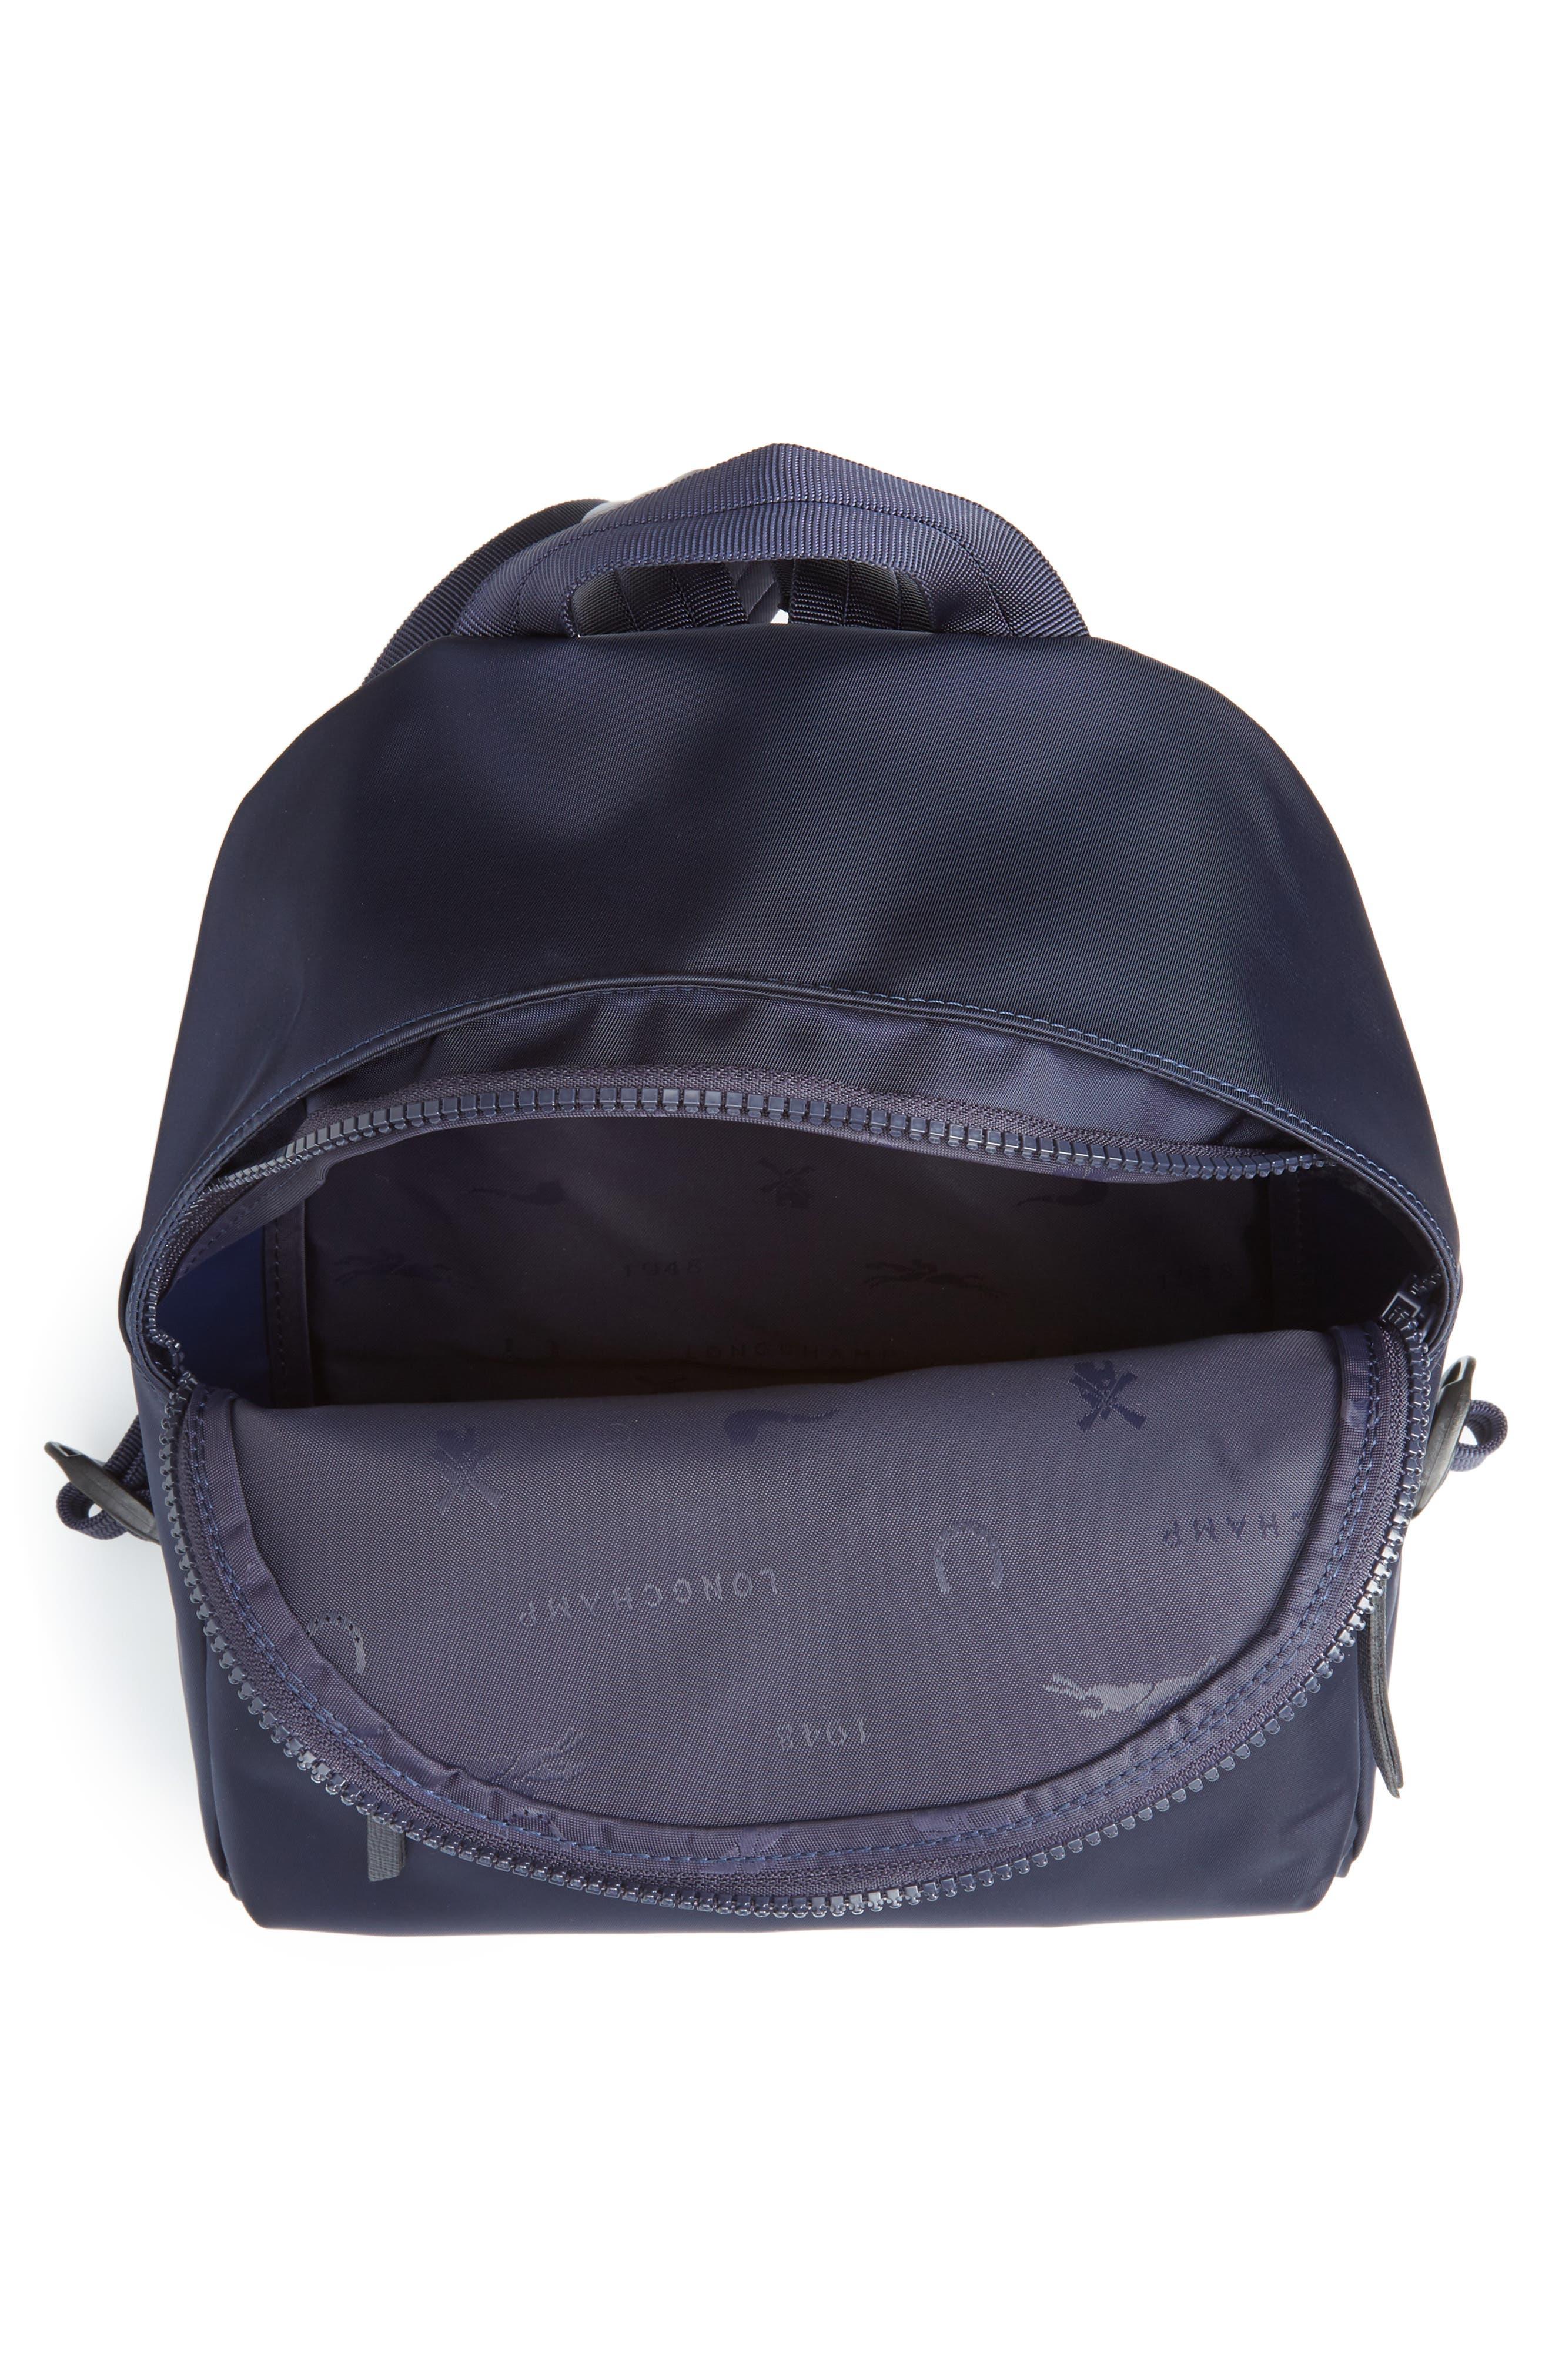 'Small Le Pliage Neo' Nylon Backpack,                             Alternate thumbnail 4, color,                             NAVY BLUE